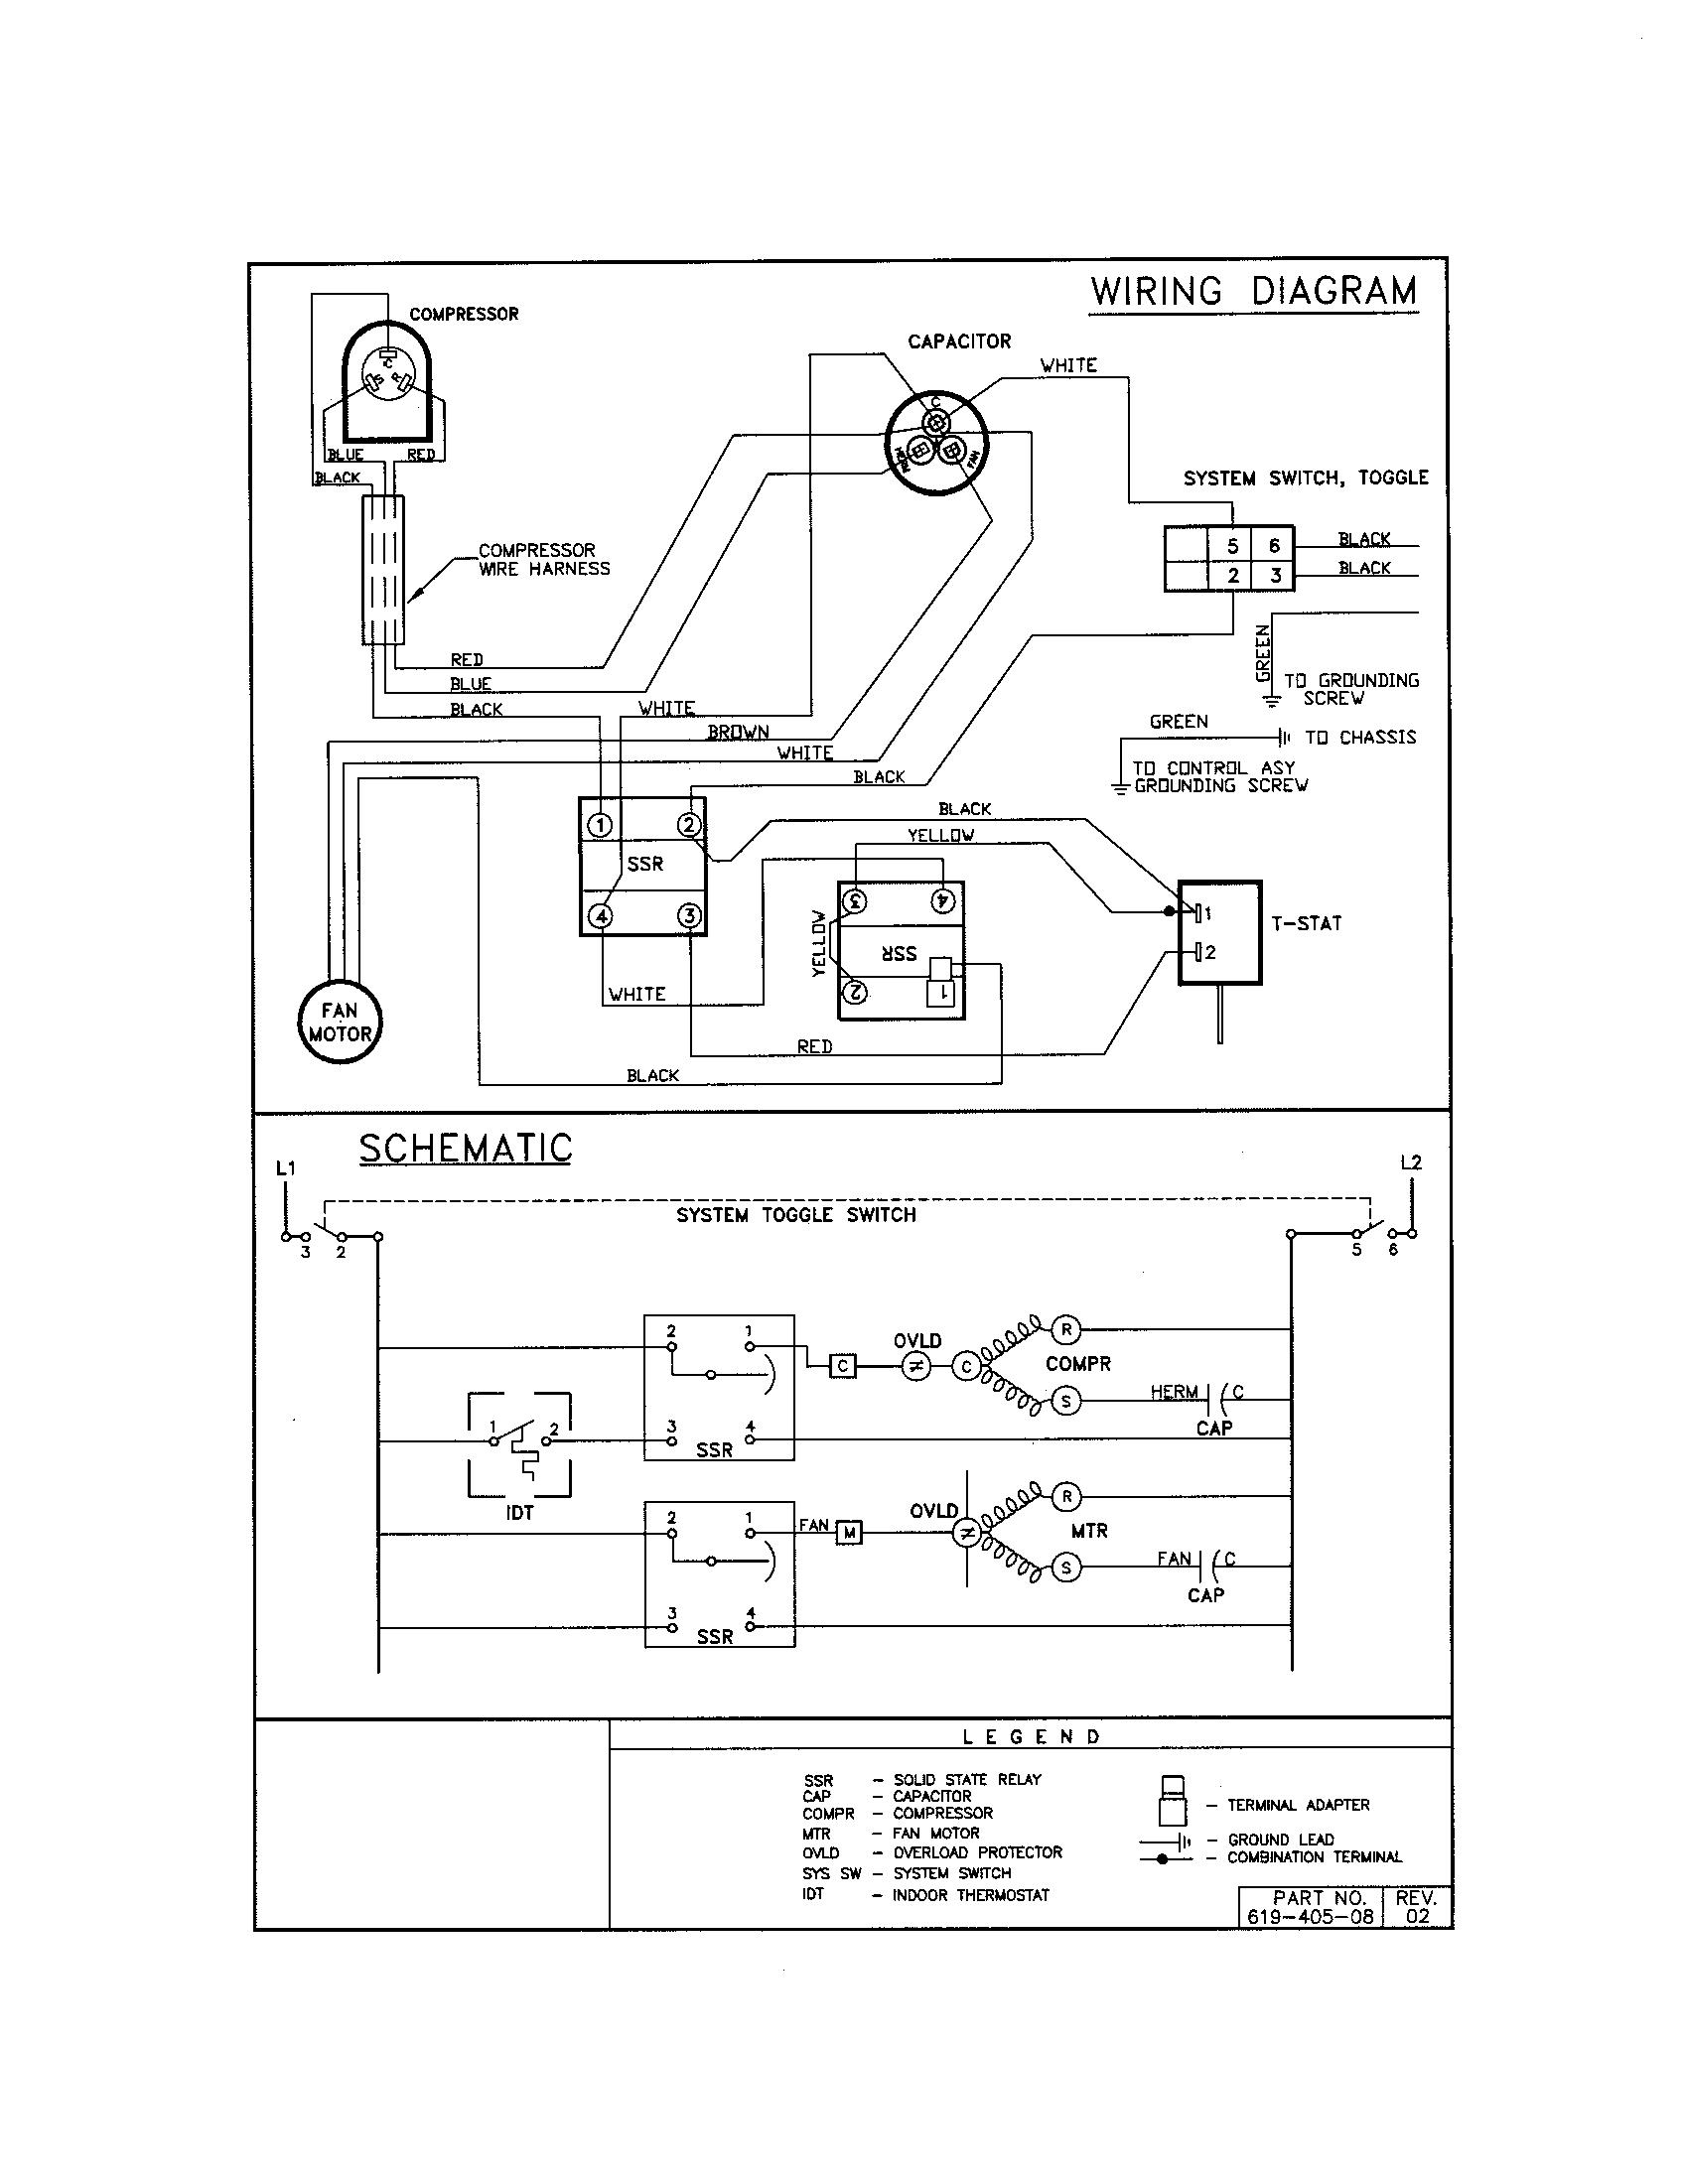 Friedrich ac wiring diagram images gallery